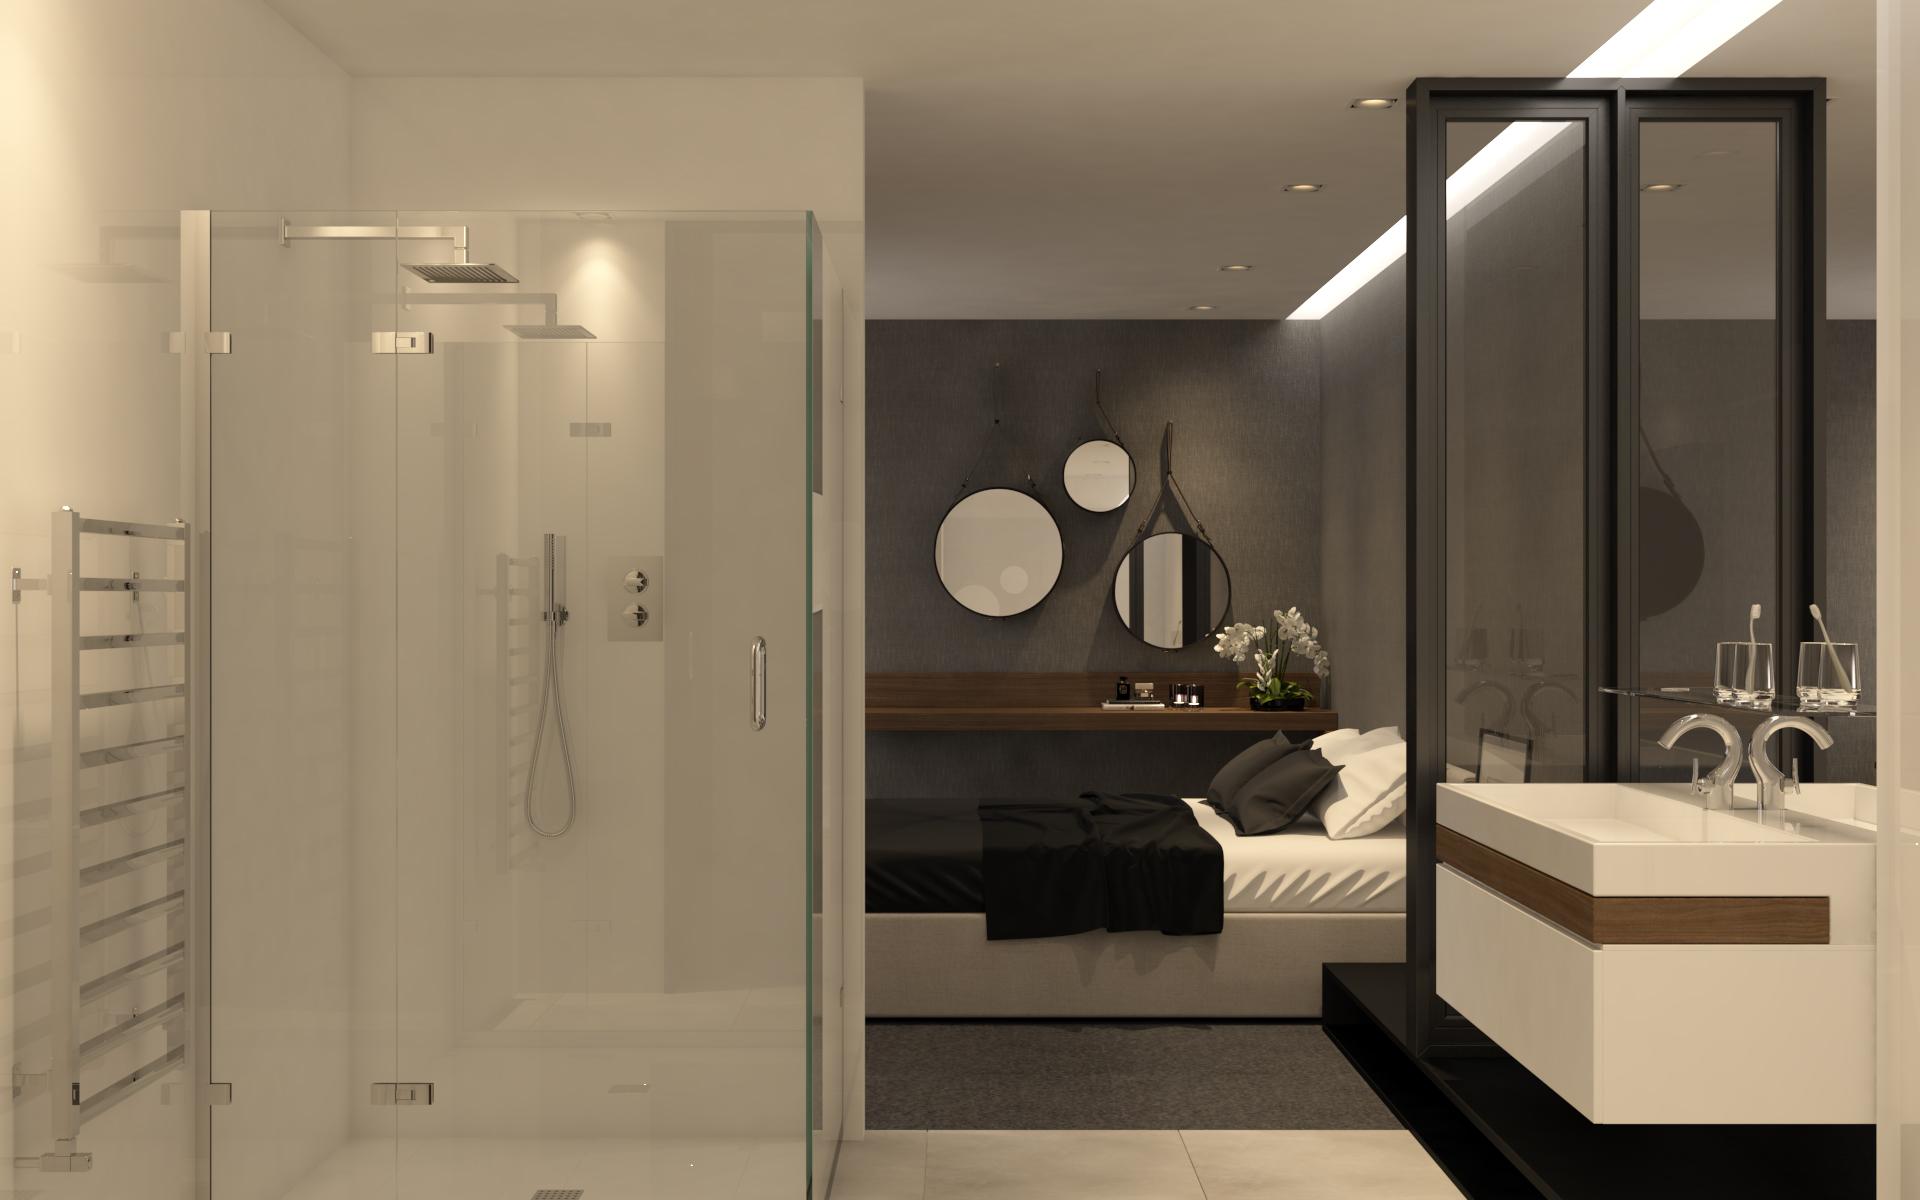 habitacion_hotel_barcelona_005